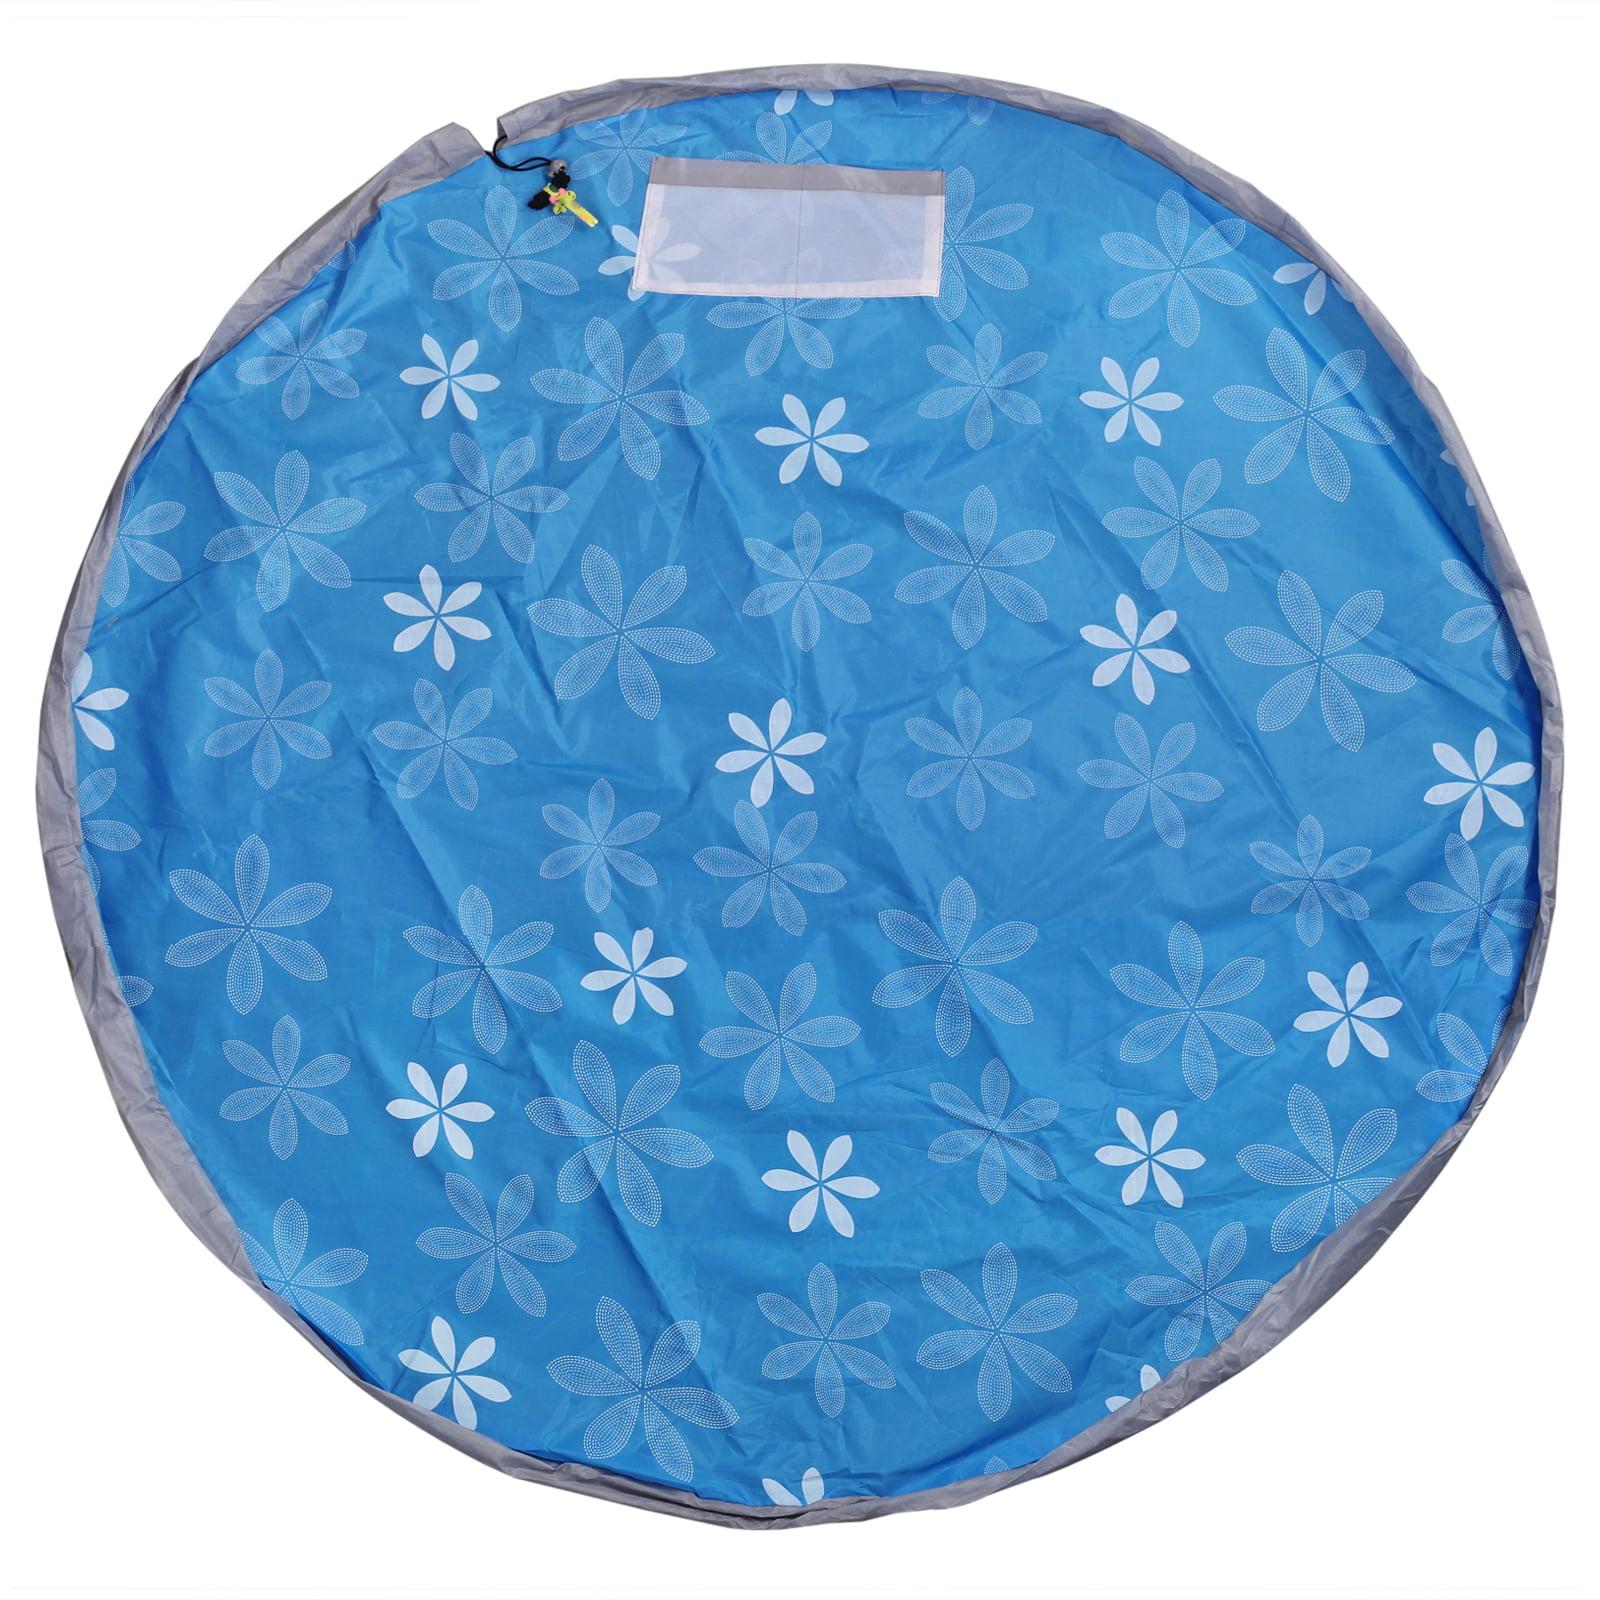 Eklead Toy Storage Bag Blue Large Tidy Bag Kids Rug Portable Kids Toys Organizer Storage Drawstring Bag Children Play Mat 150cm